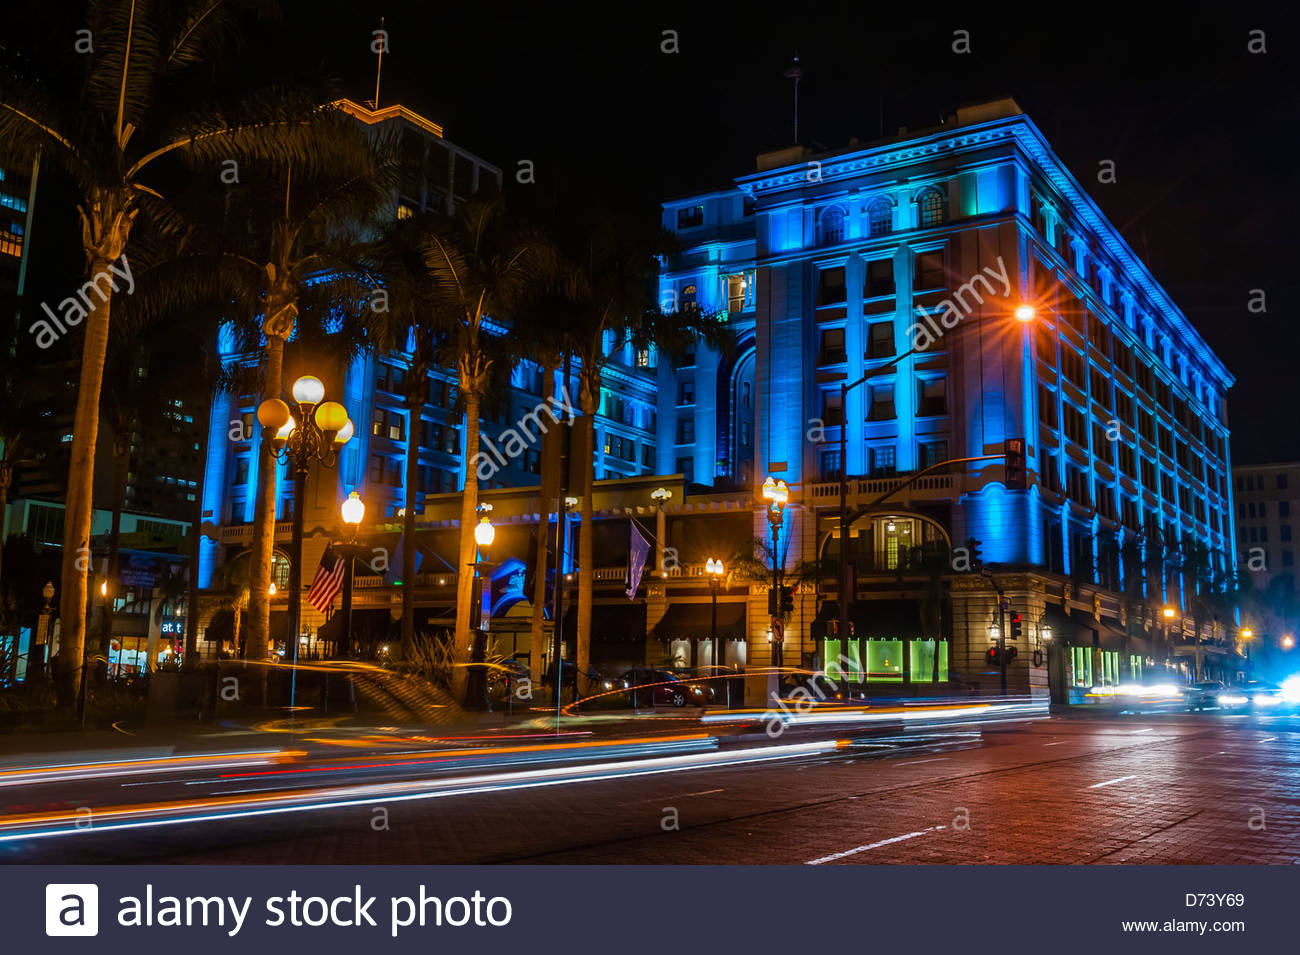 U S Grant Hotel Gaslamp Quarter Downtown San Diego California